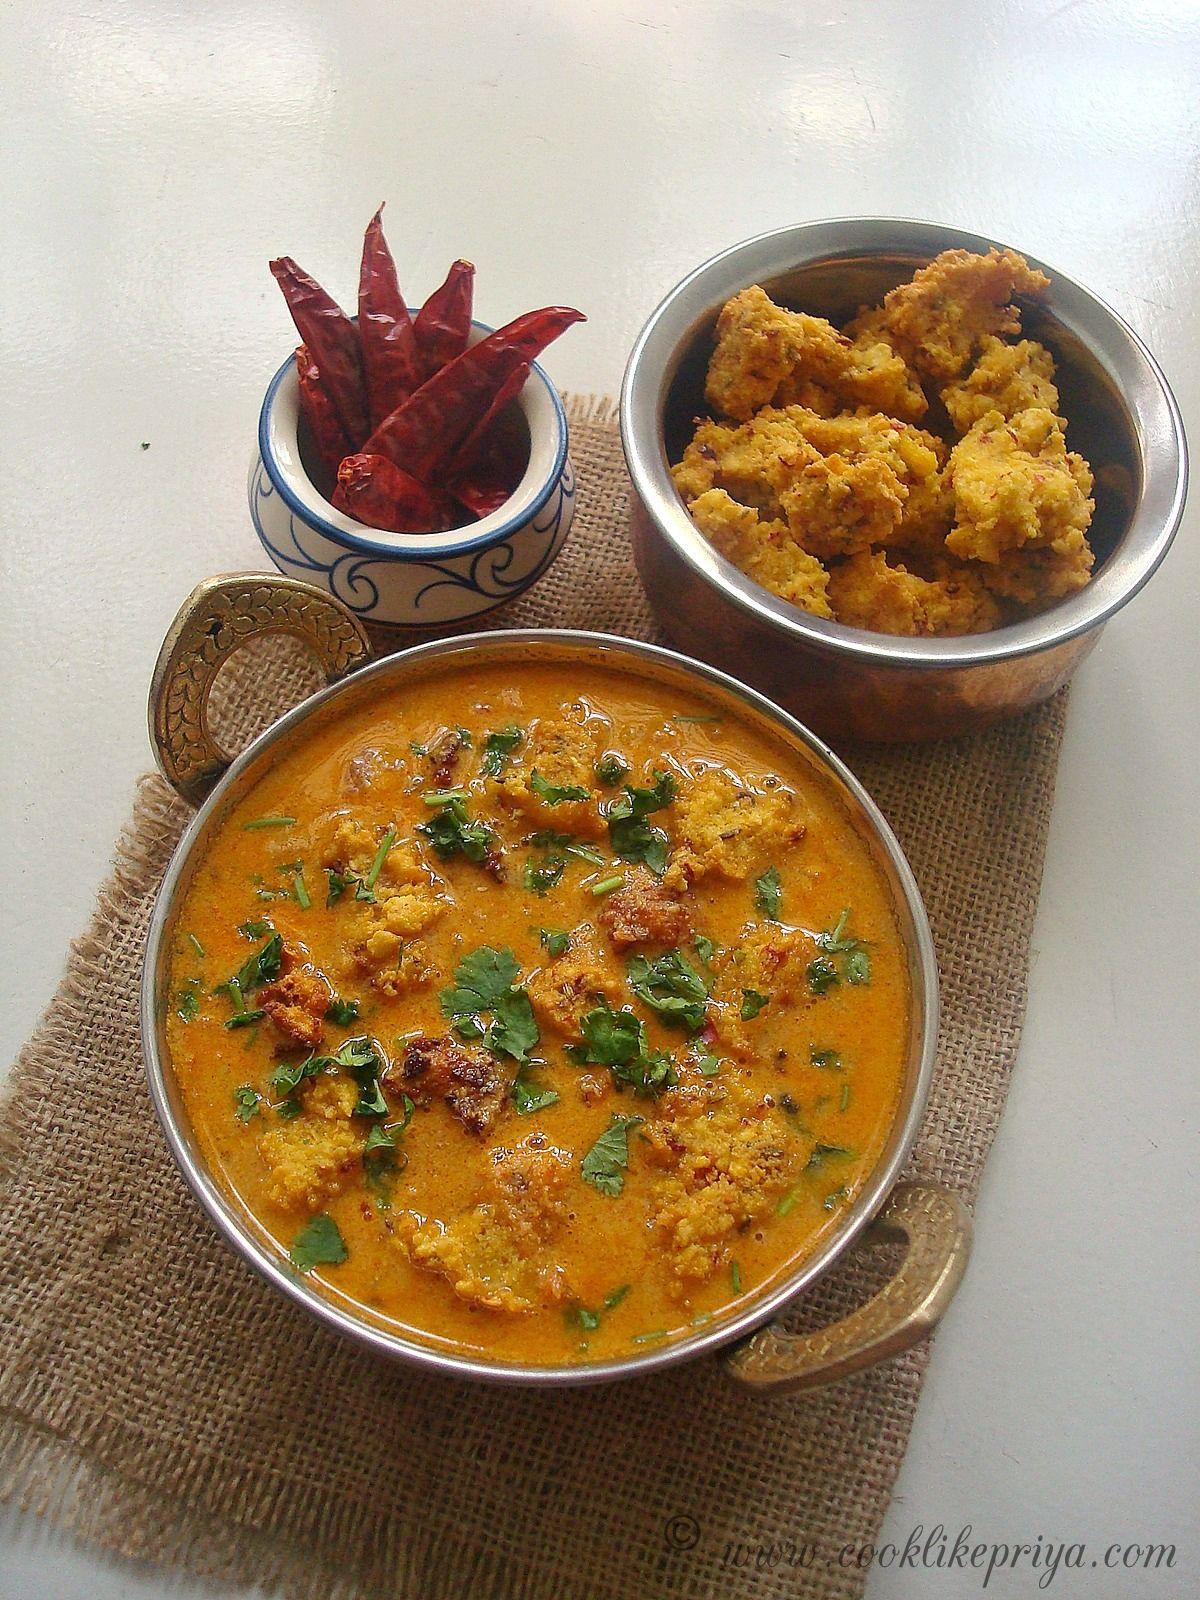 Chettinad pakkoda kuzhambu chettinad lentil curry pakoda chettinad pakkoda kuzhambu chettinad lentil curry pakoda kuzhambhu recipe forumfinder Gallery